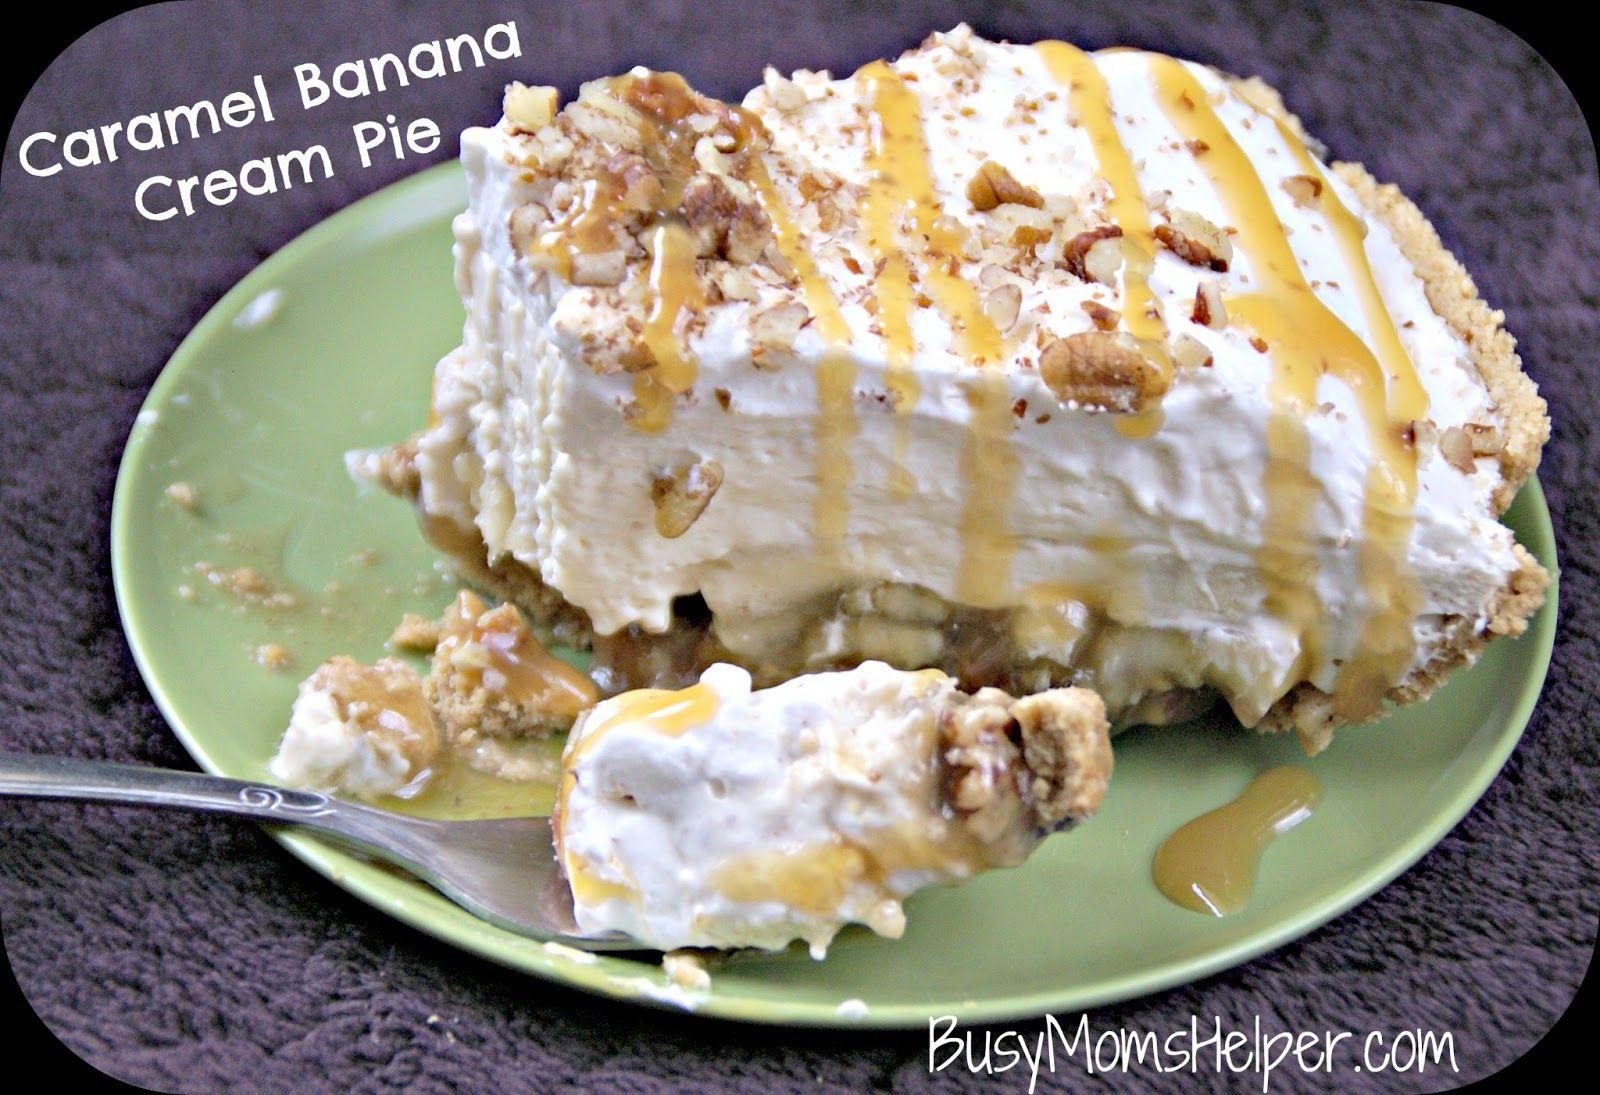 Busy Moms Helper: Caramel Banana Cream Pie